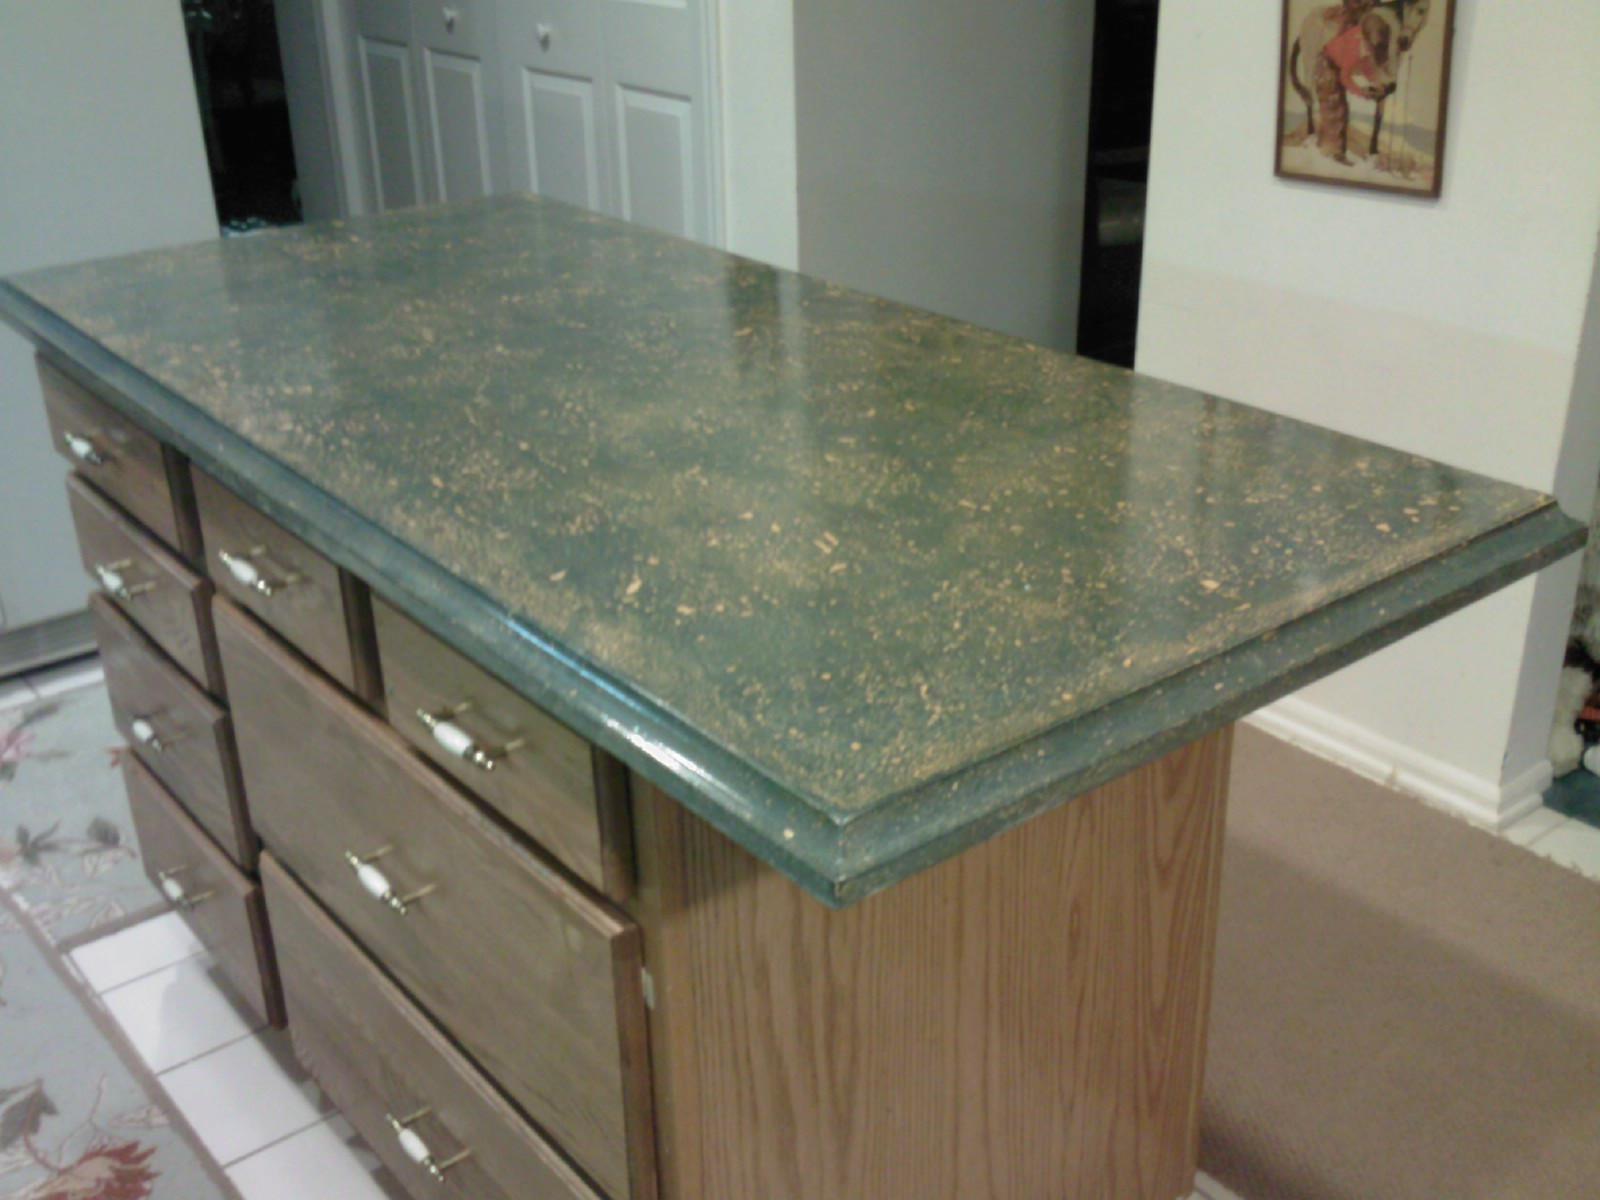 Best ideas about DIY Concrete Countertops Cost . Save or Pin How To Make Concrete Countertops Ideas Now.